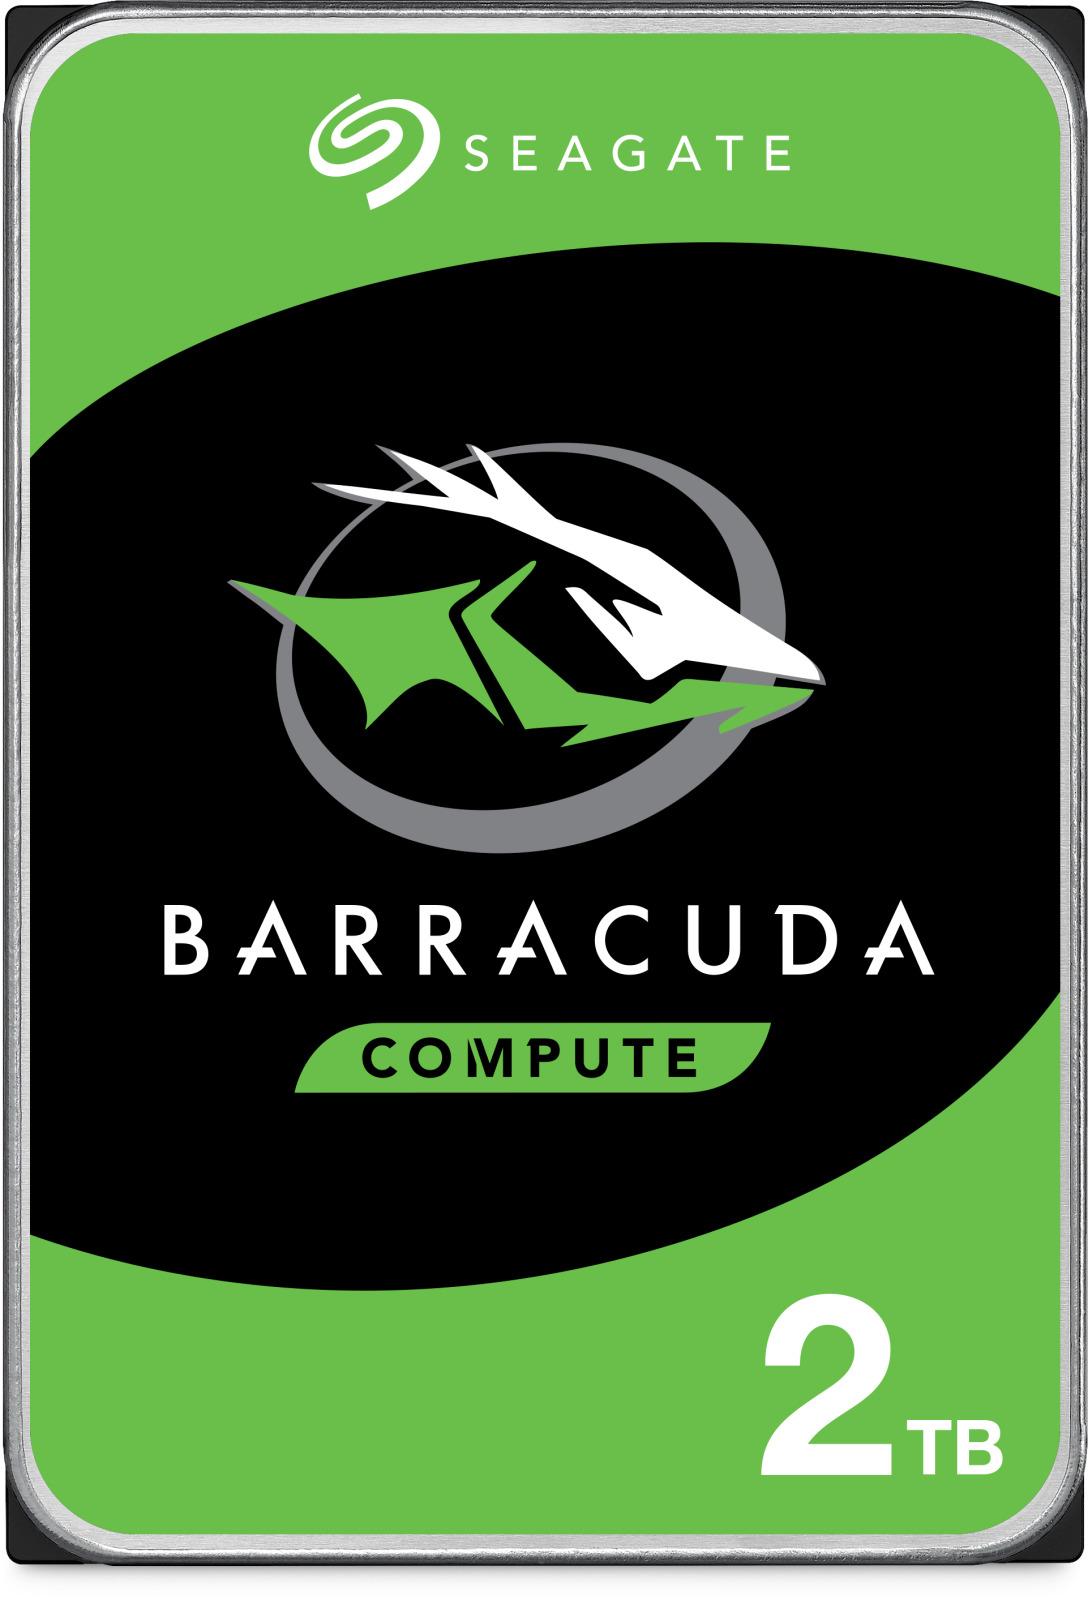 2TB Seagate BarraCuda HDD image